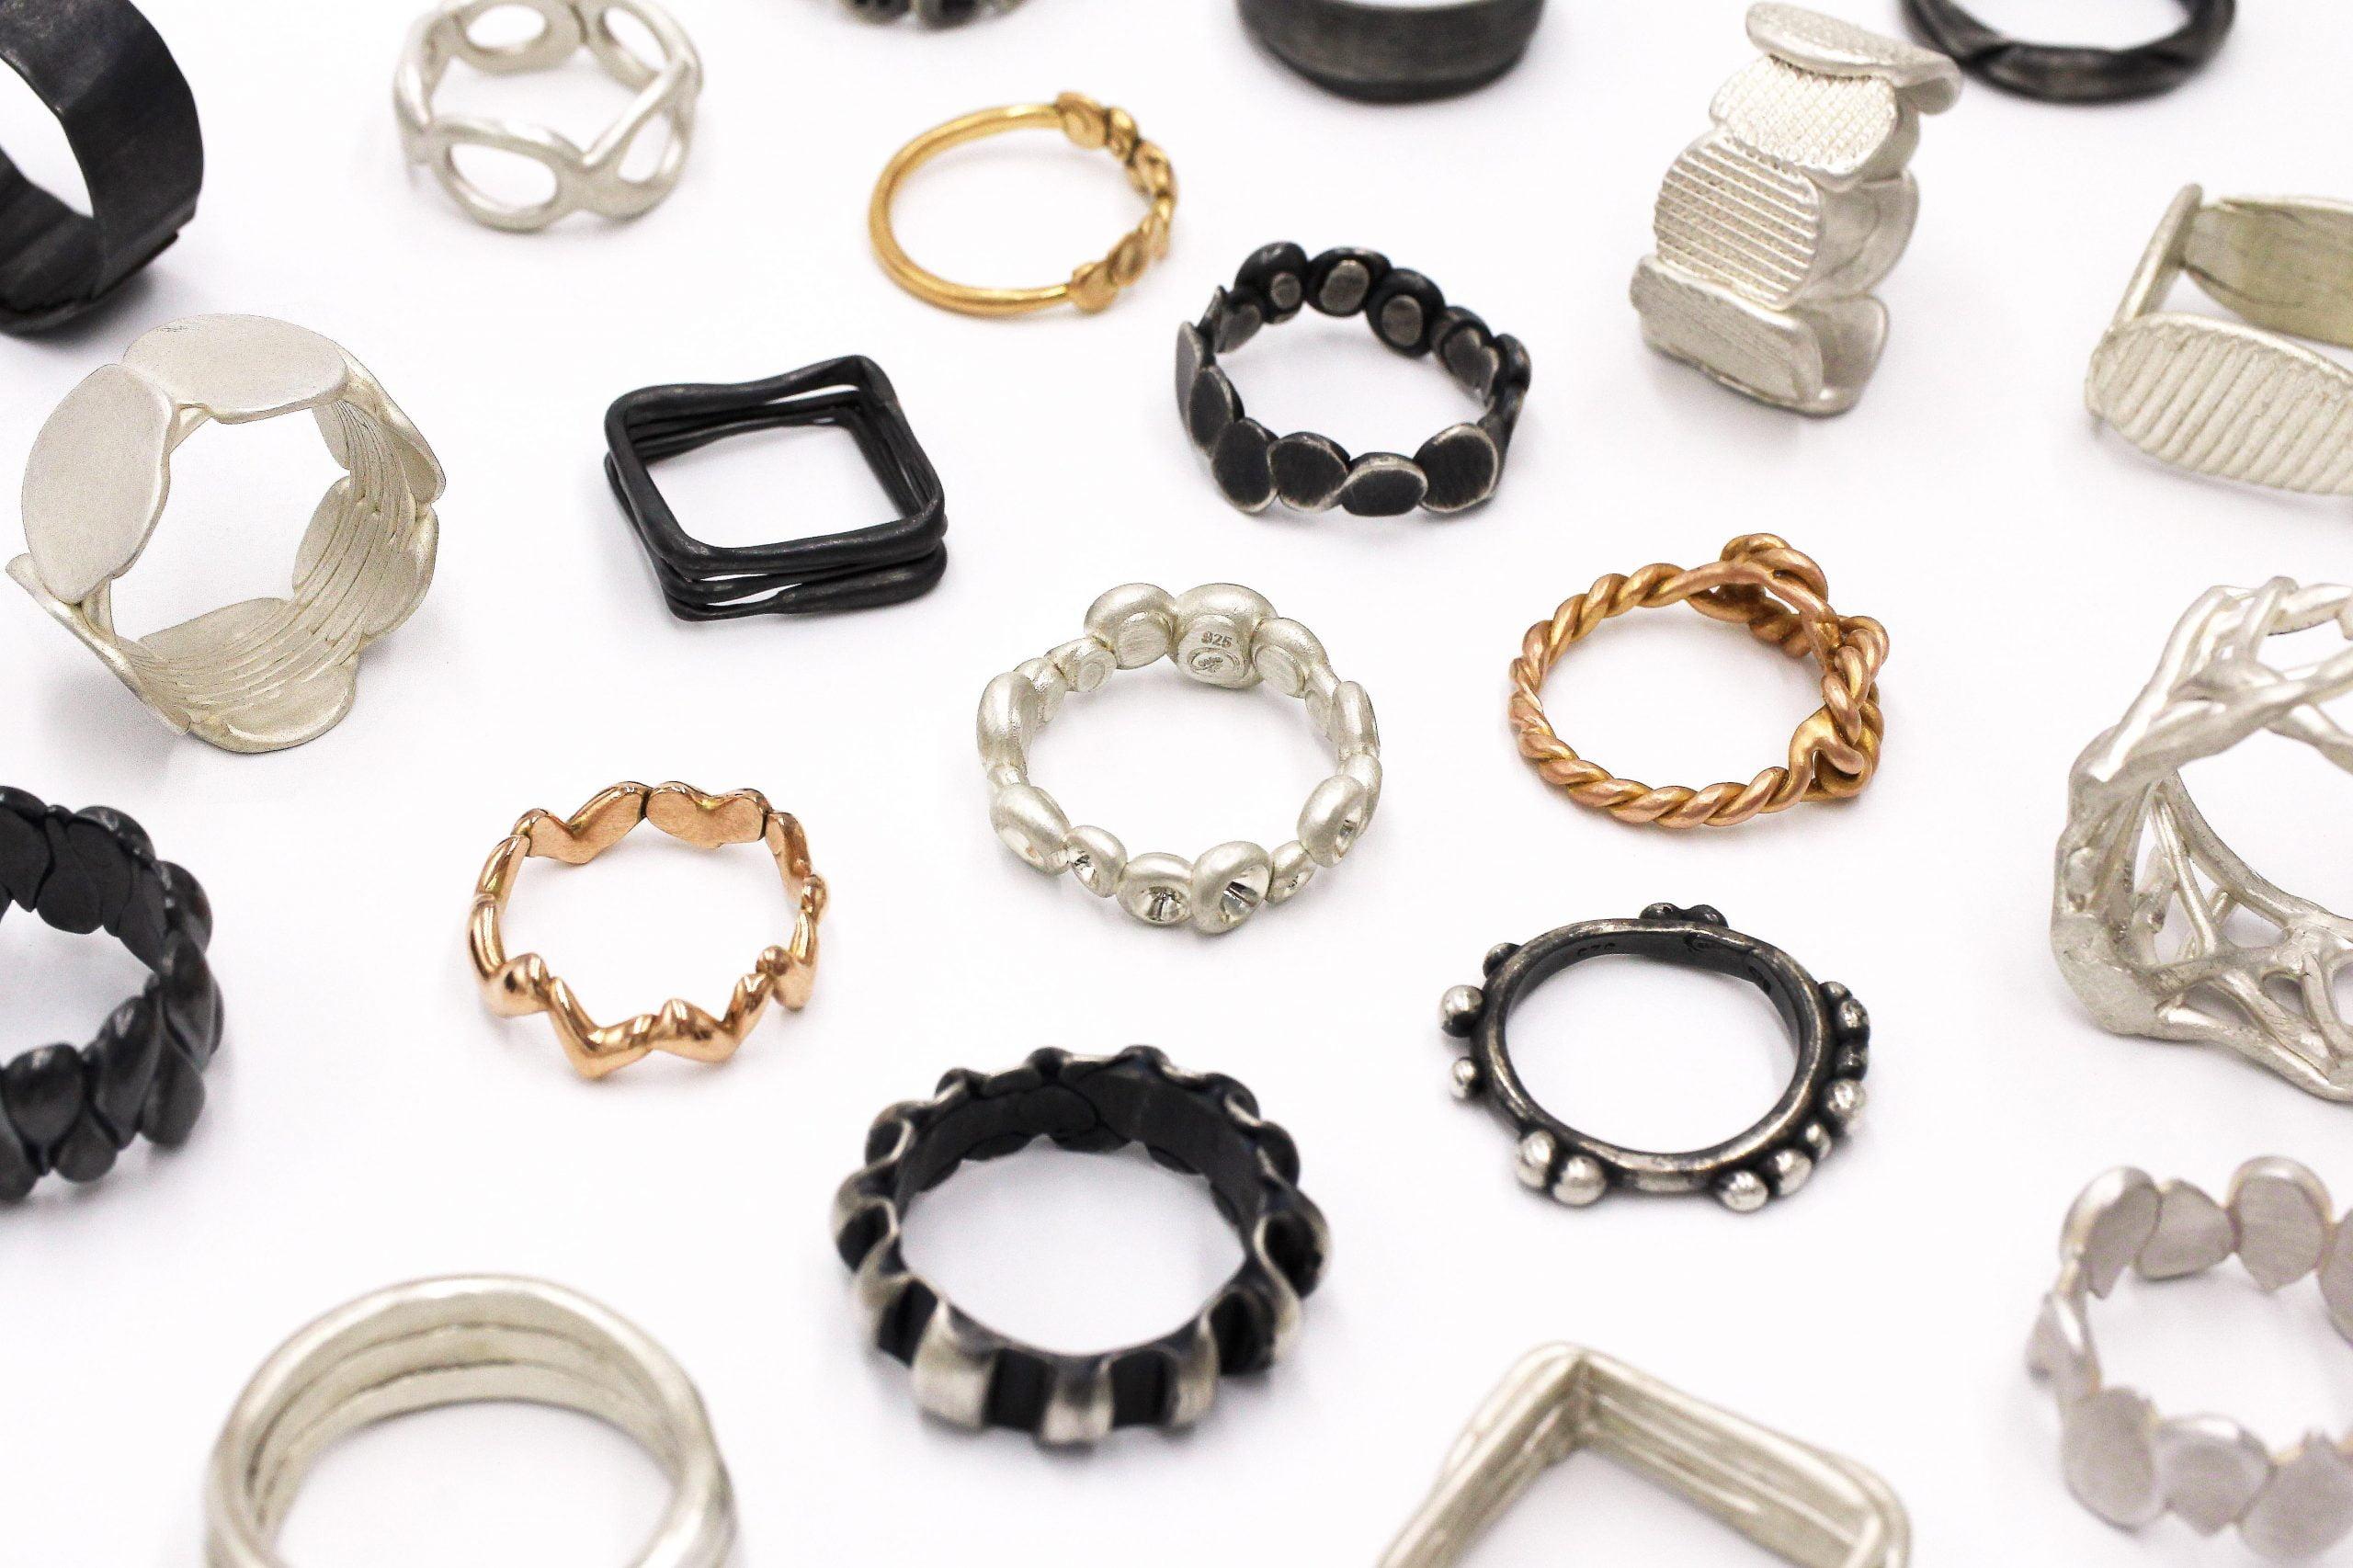 New Custom Rings!